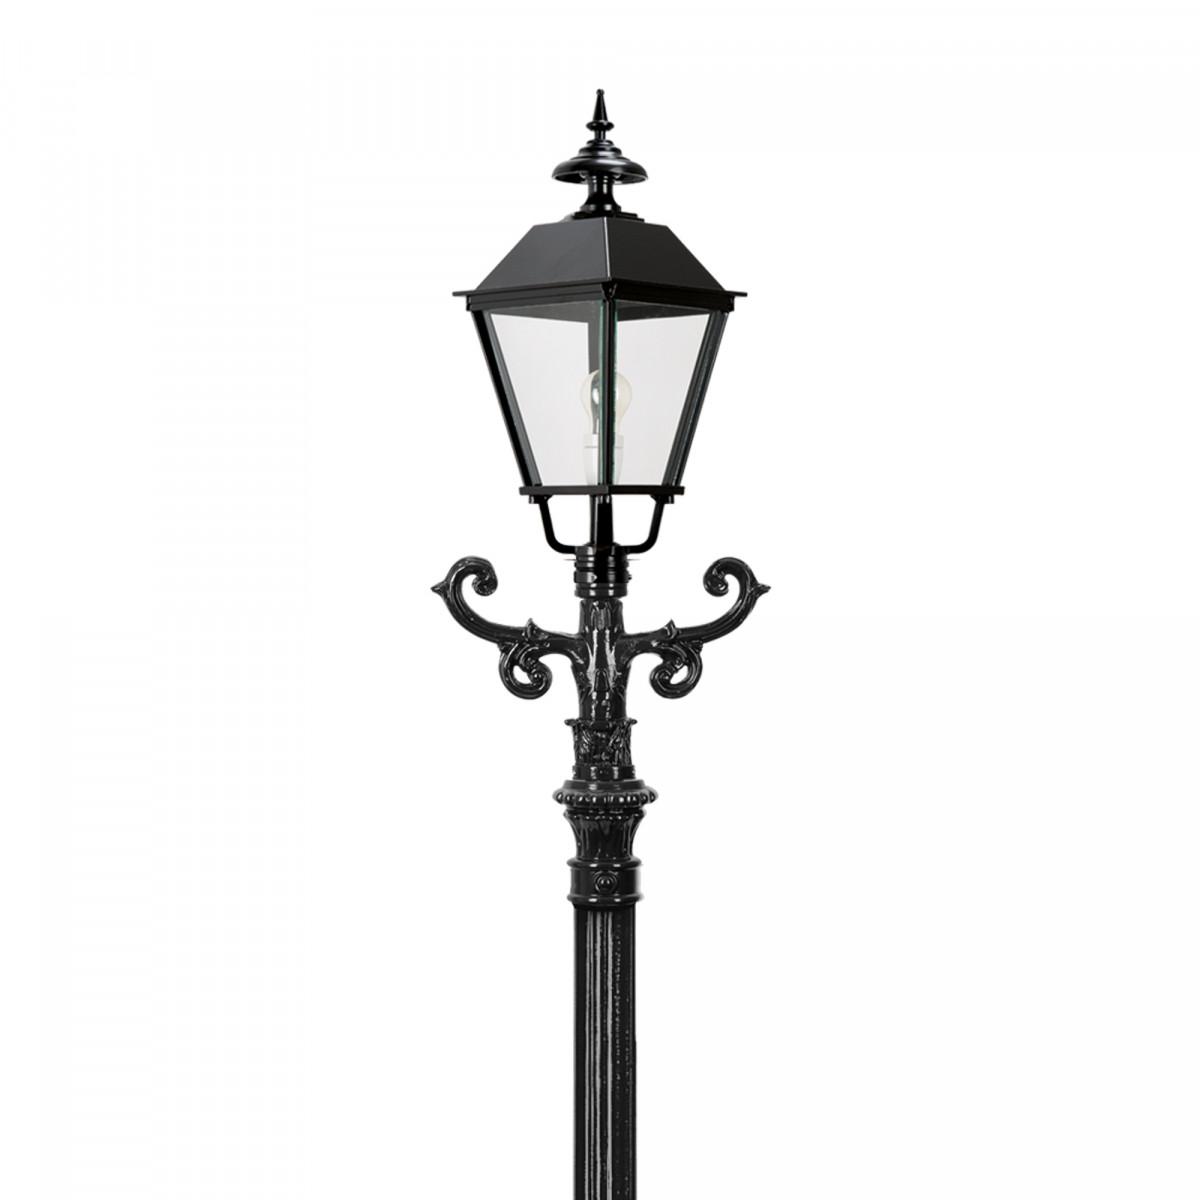 Lantaarn Aken - Buitenverlichting Vierkant